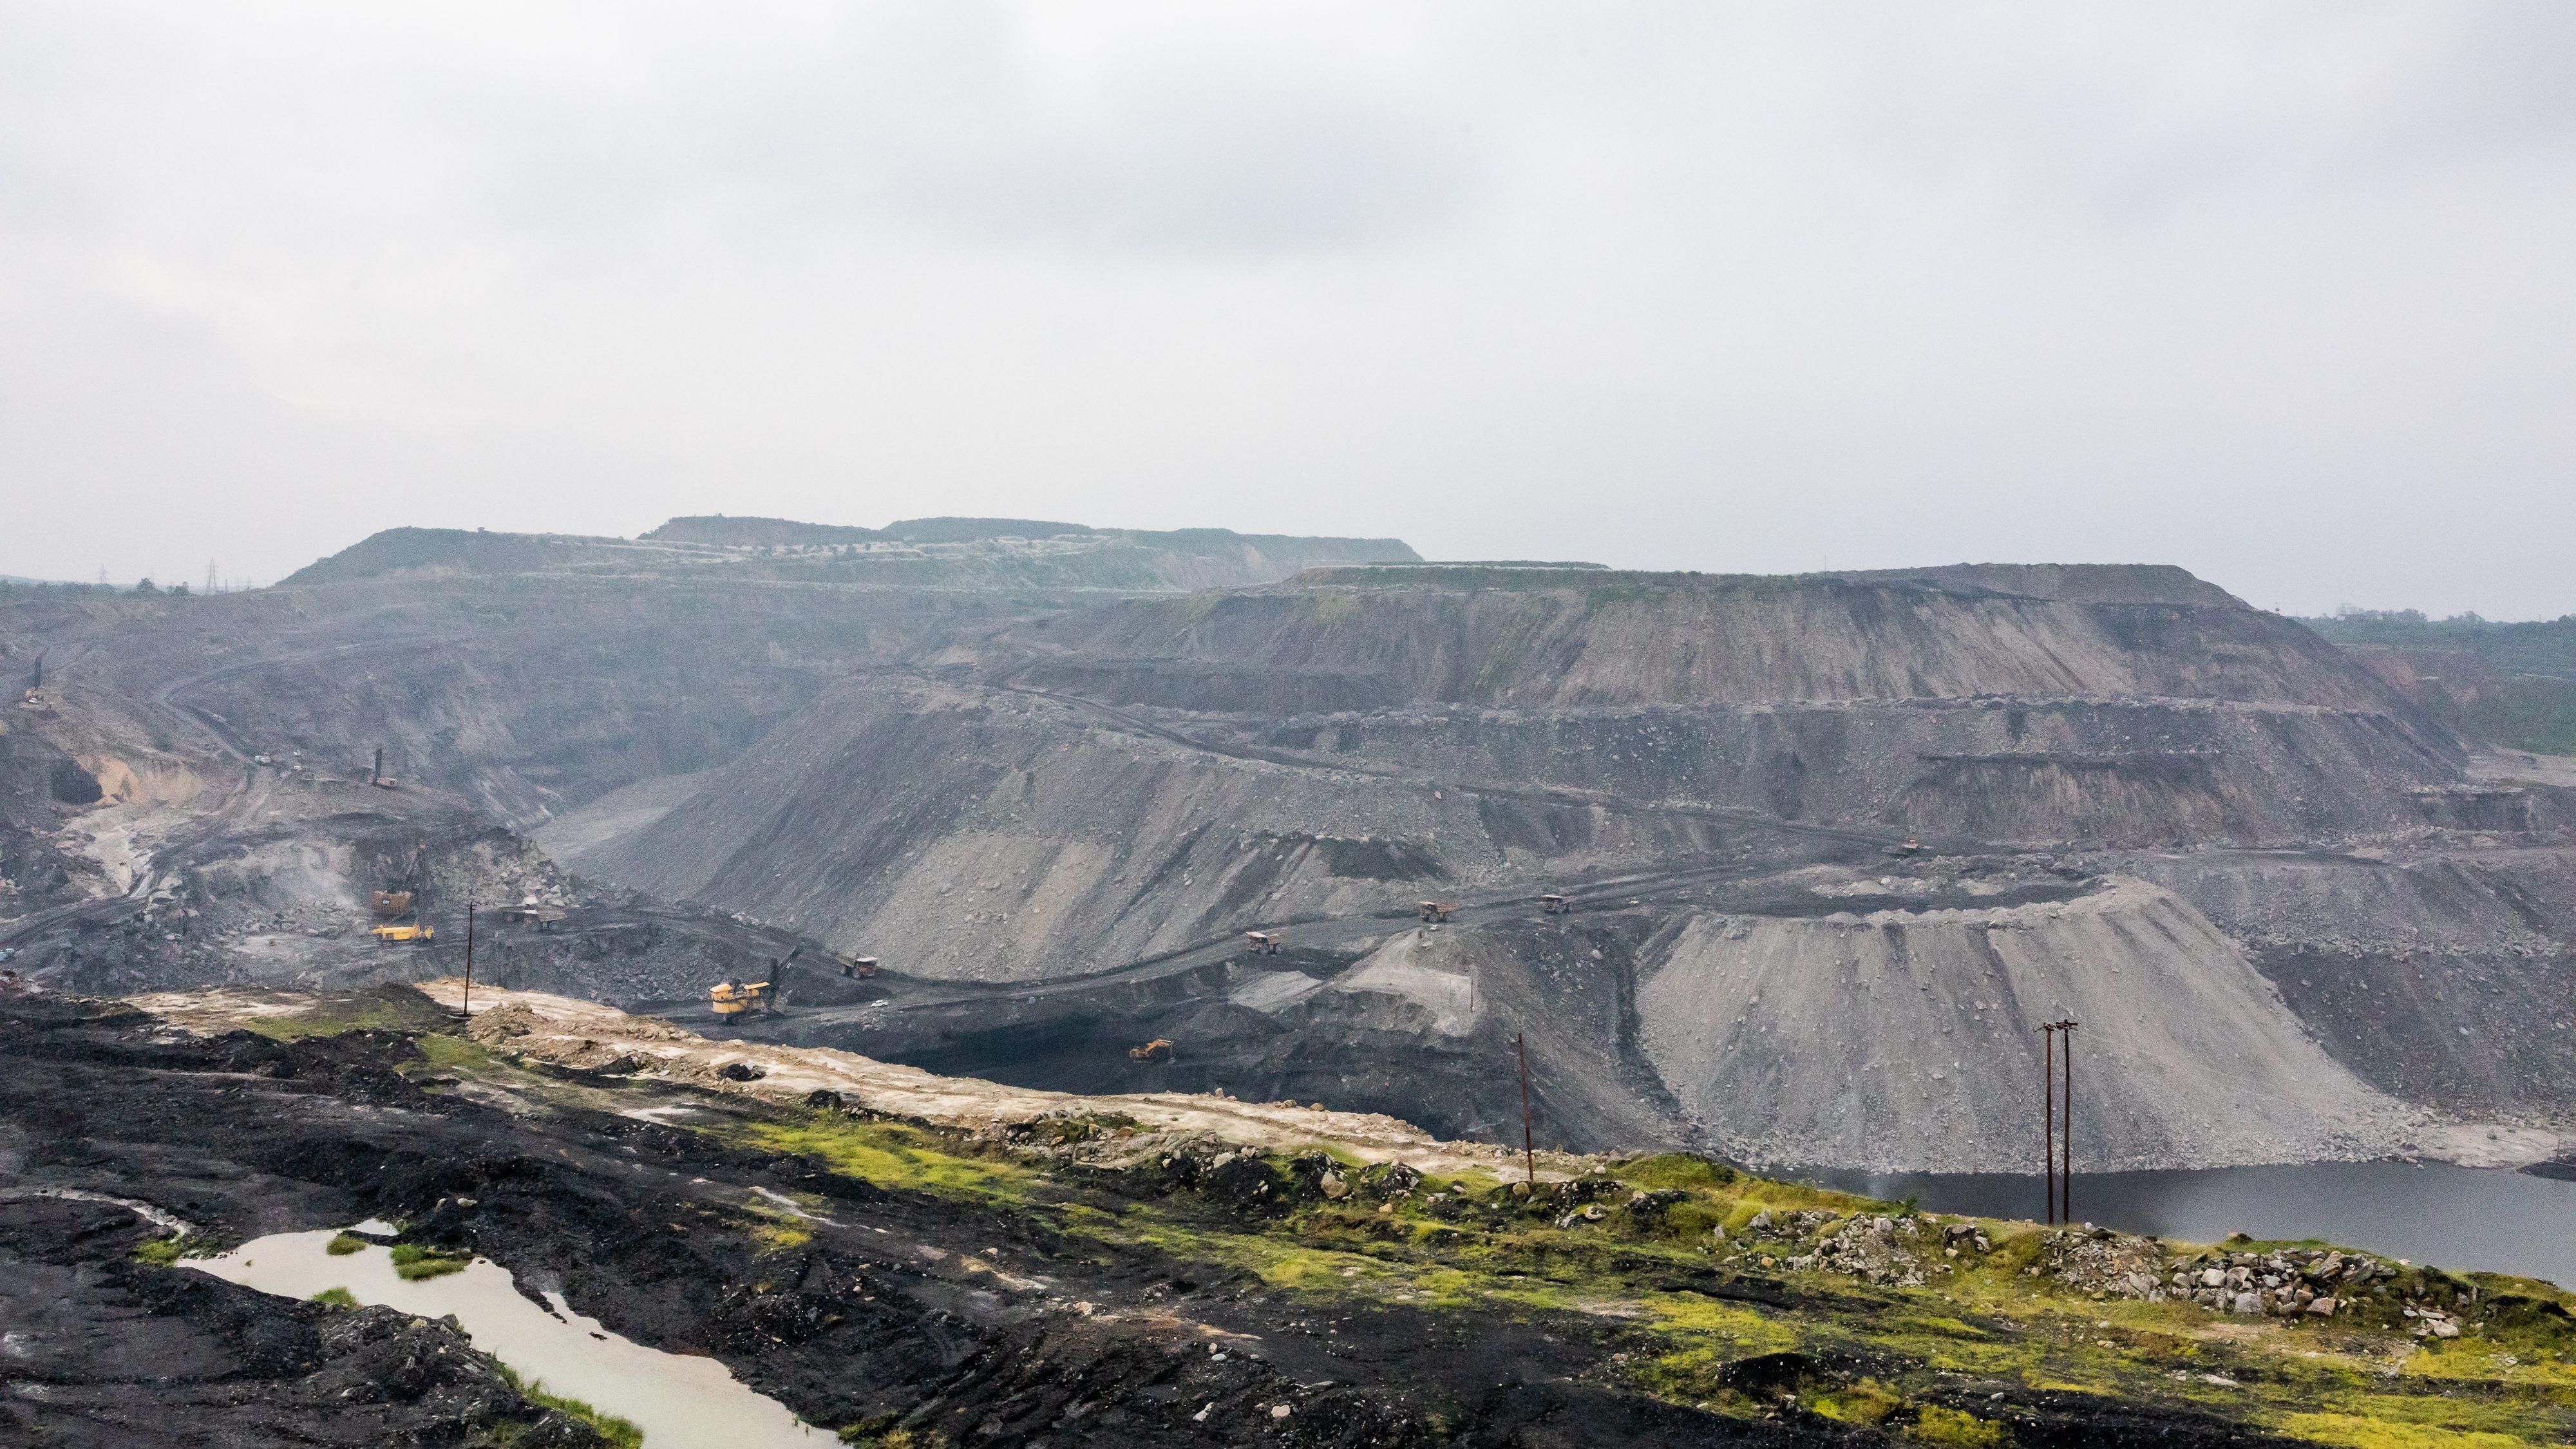 The Dipka Extension mine near Hardi Bazar in Korba, Chhattisgarh, India.